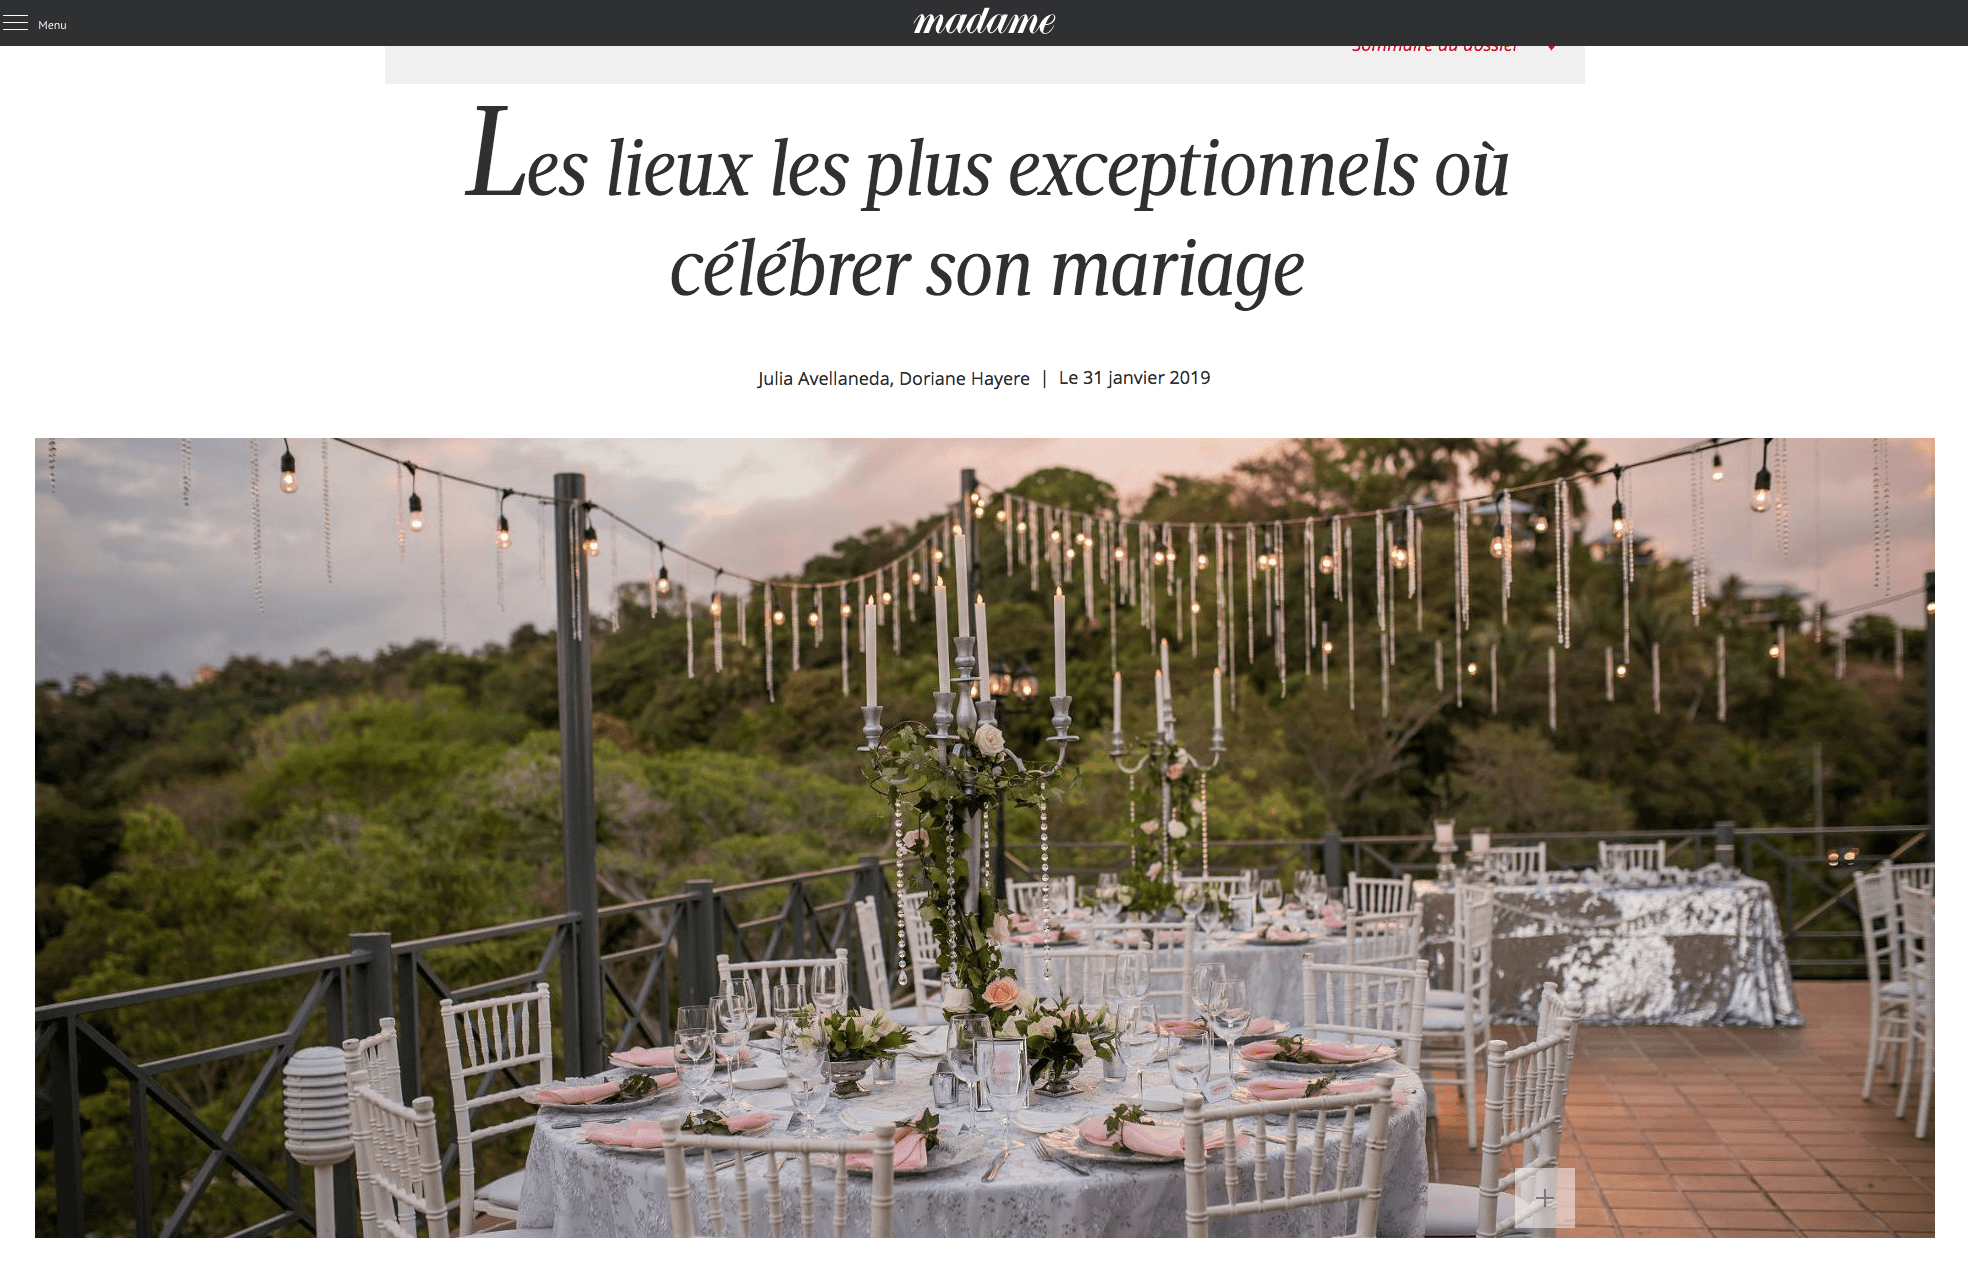 Le Figaro Madame Featured Costa Rica Wedding